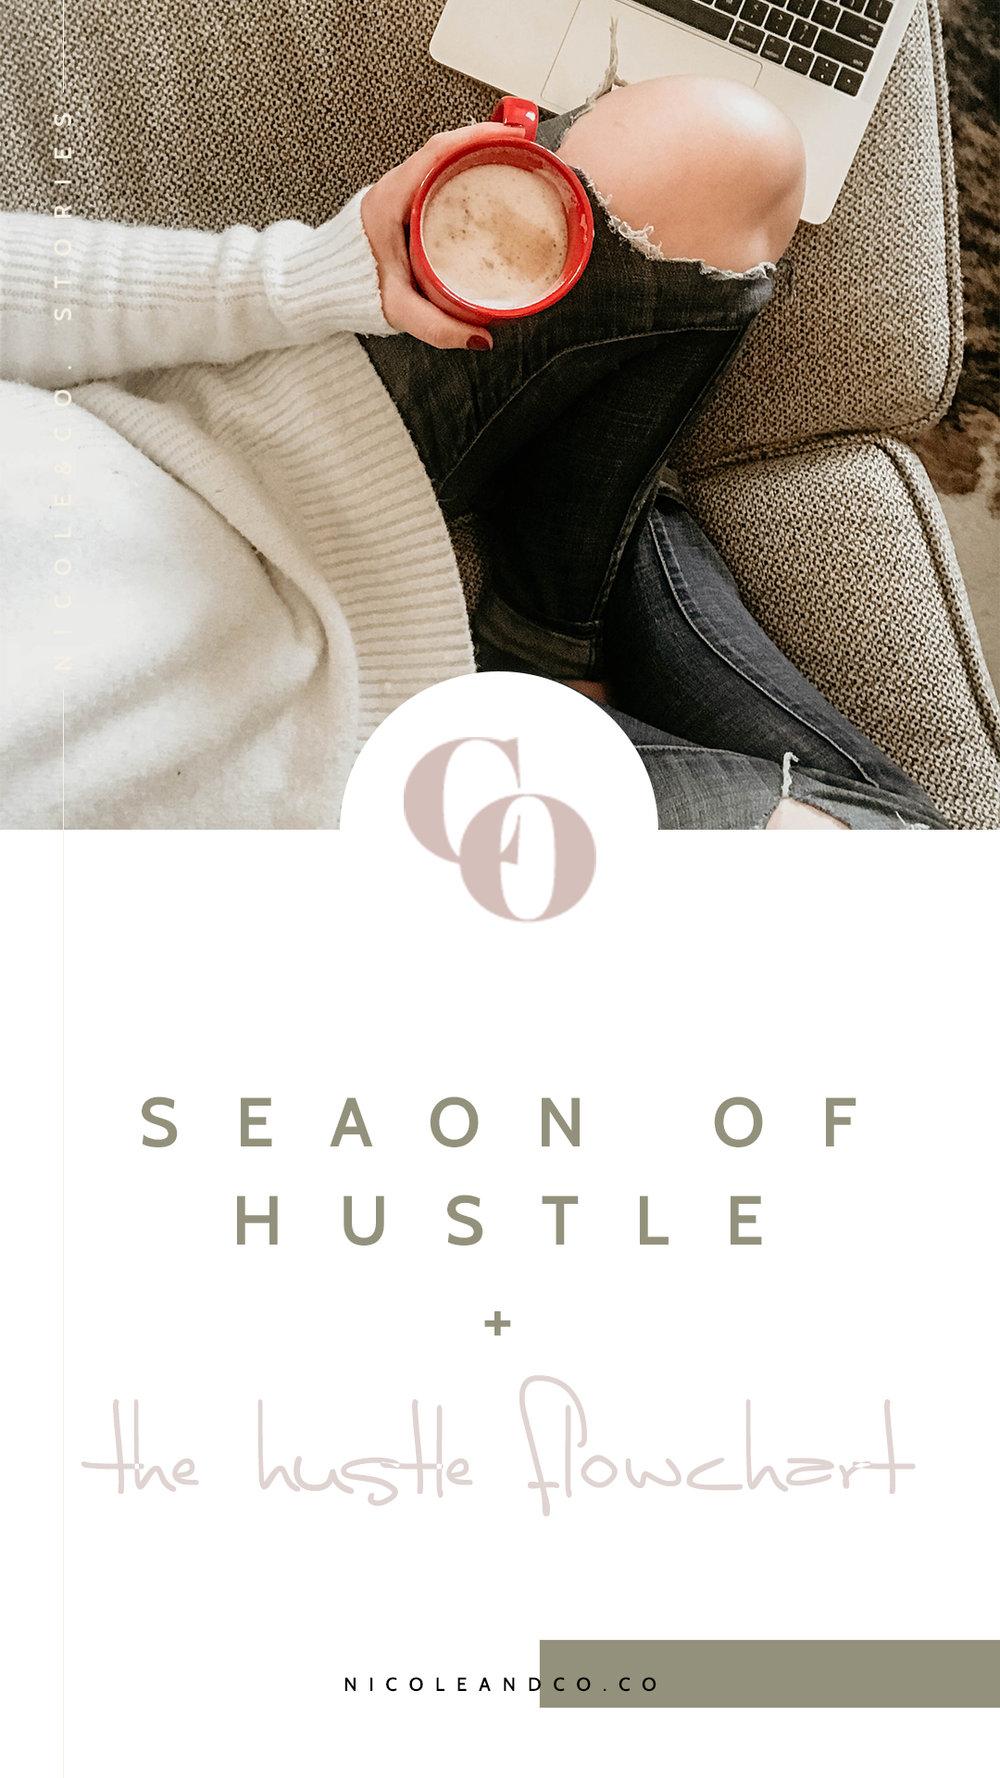 HustleFlowchart-Header.jpg